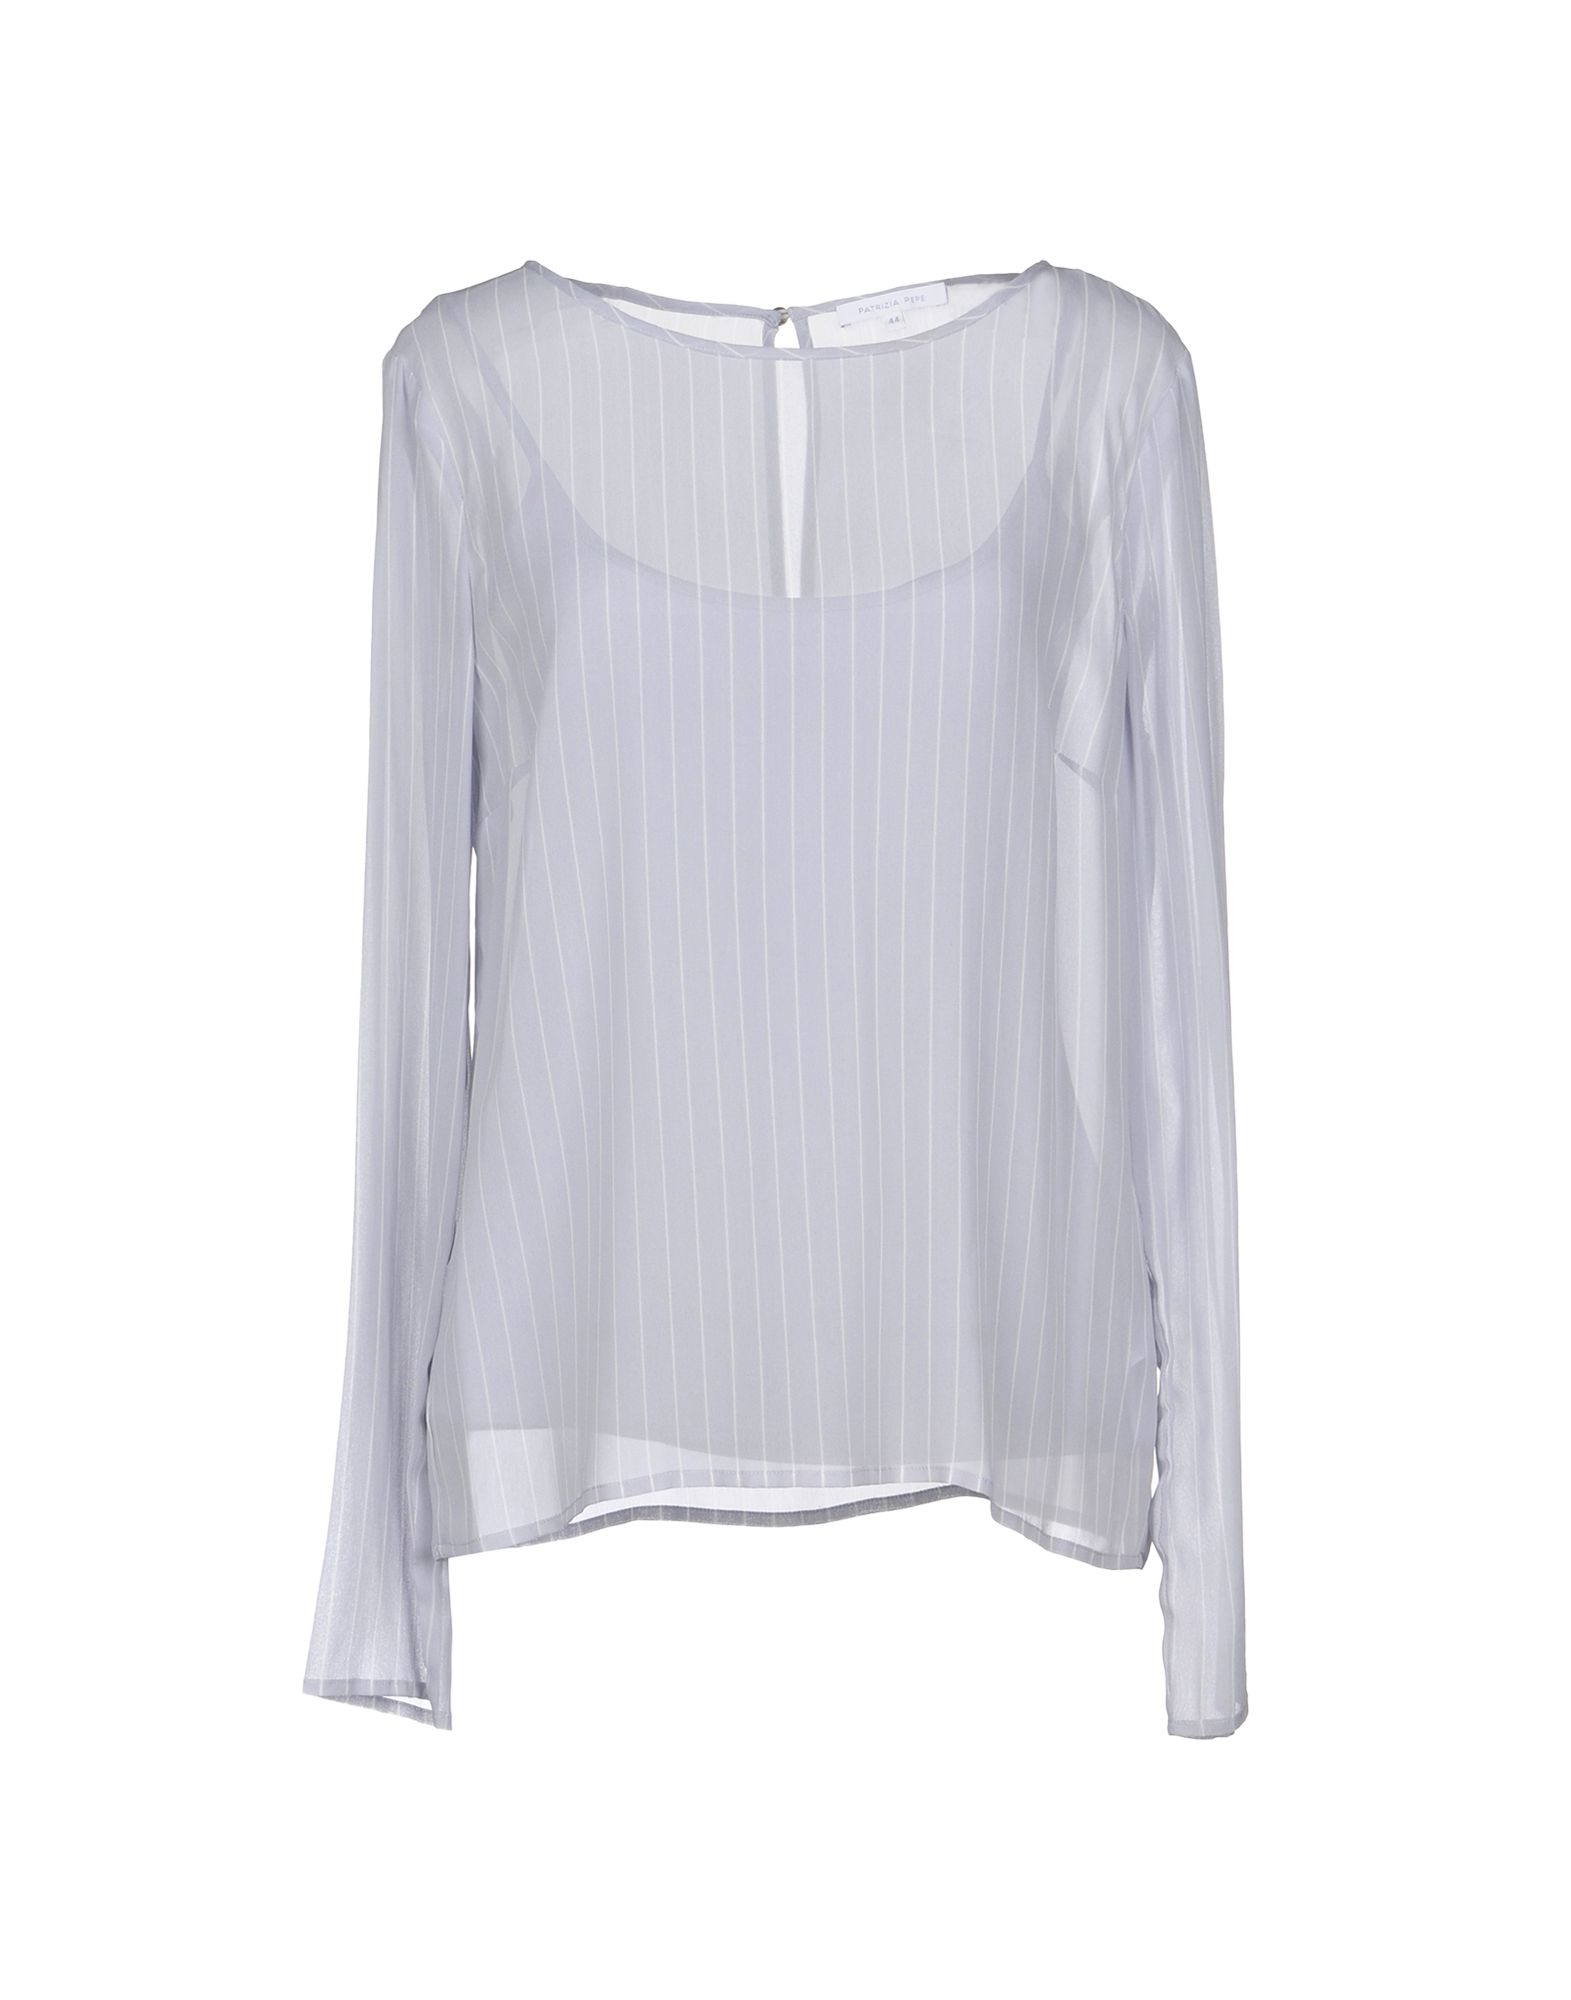 PATRIZIA PEPE Блузка patrizia pepe блузка из вискозного жоржета page 1